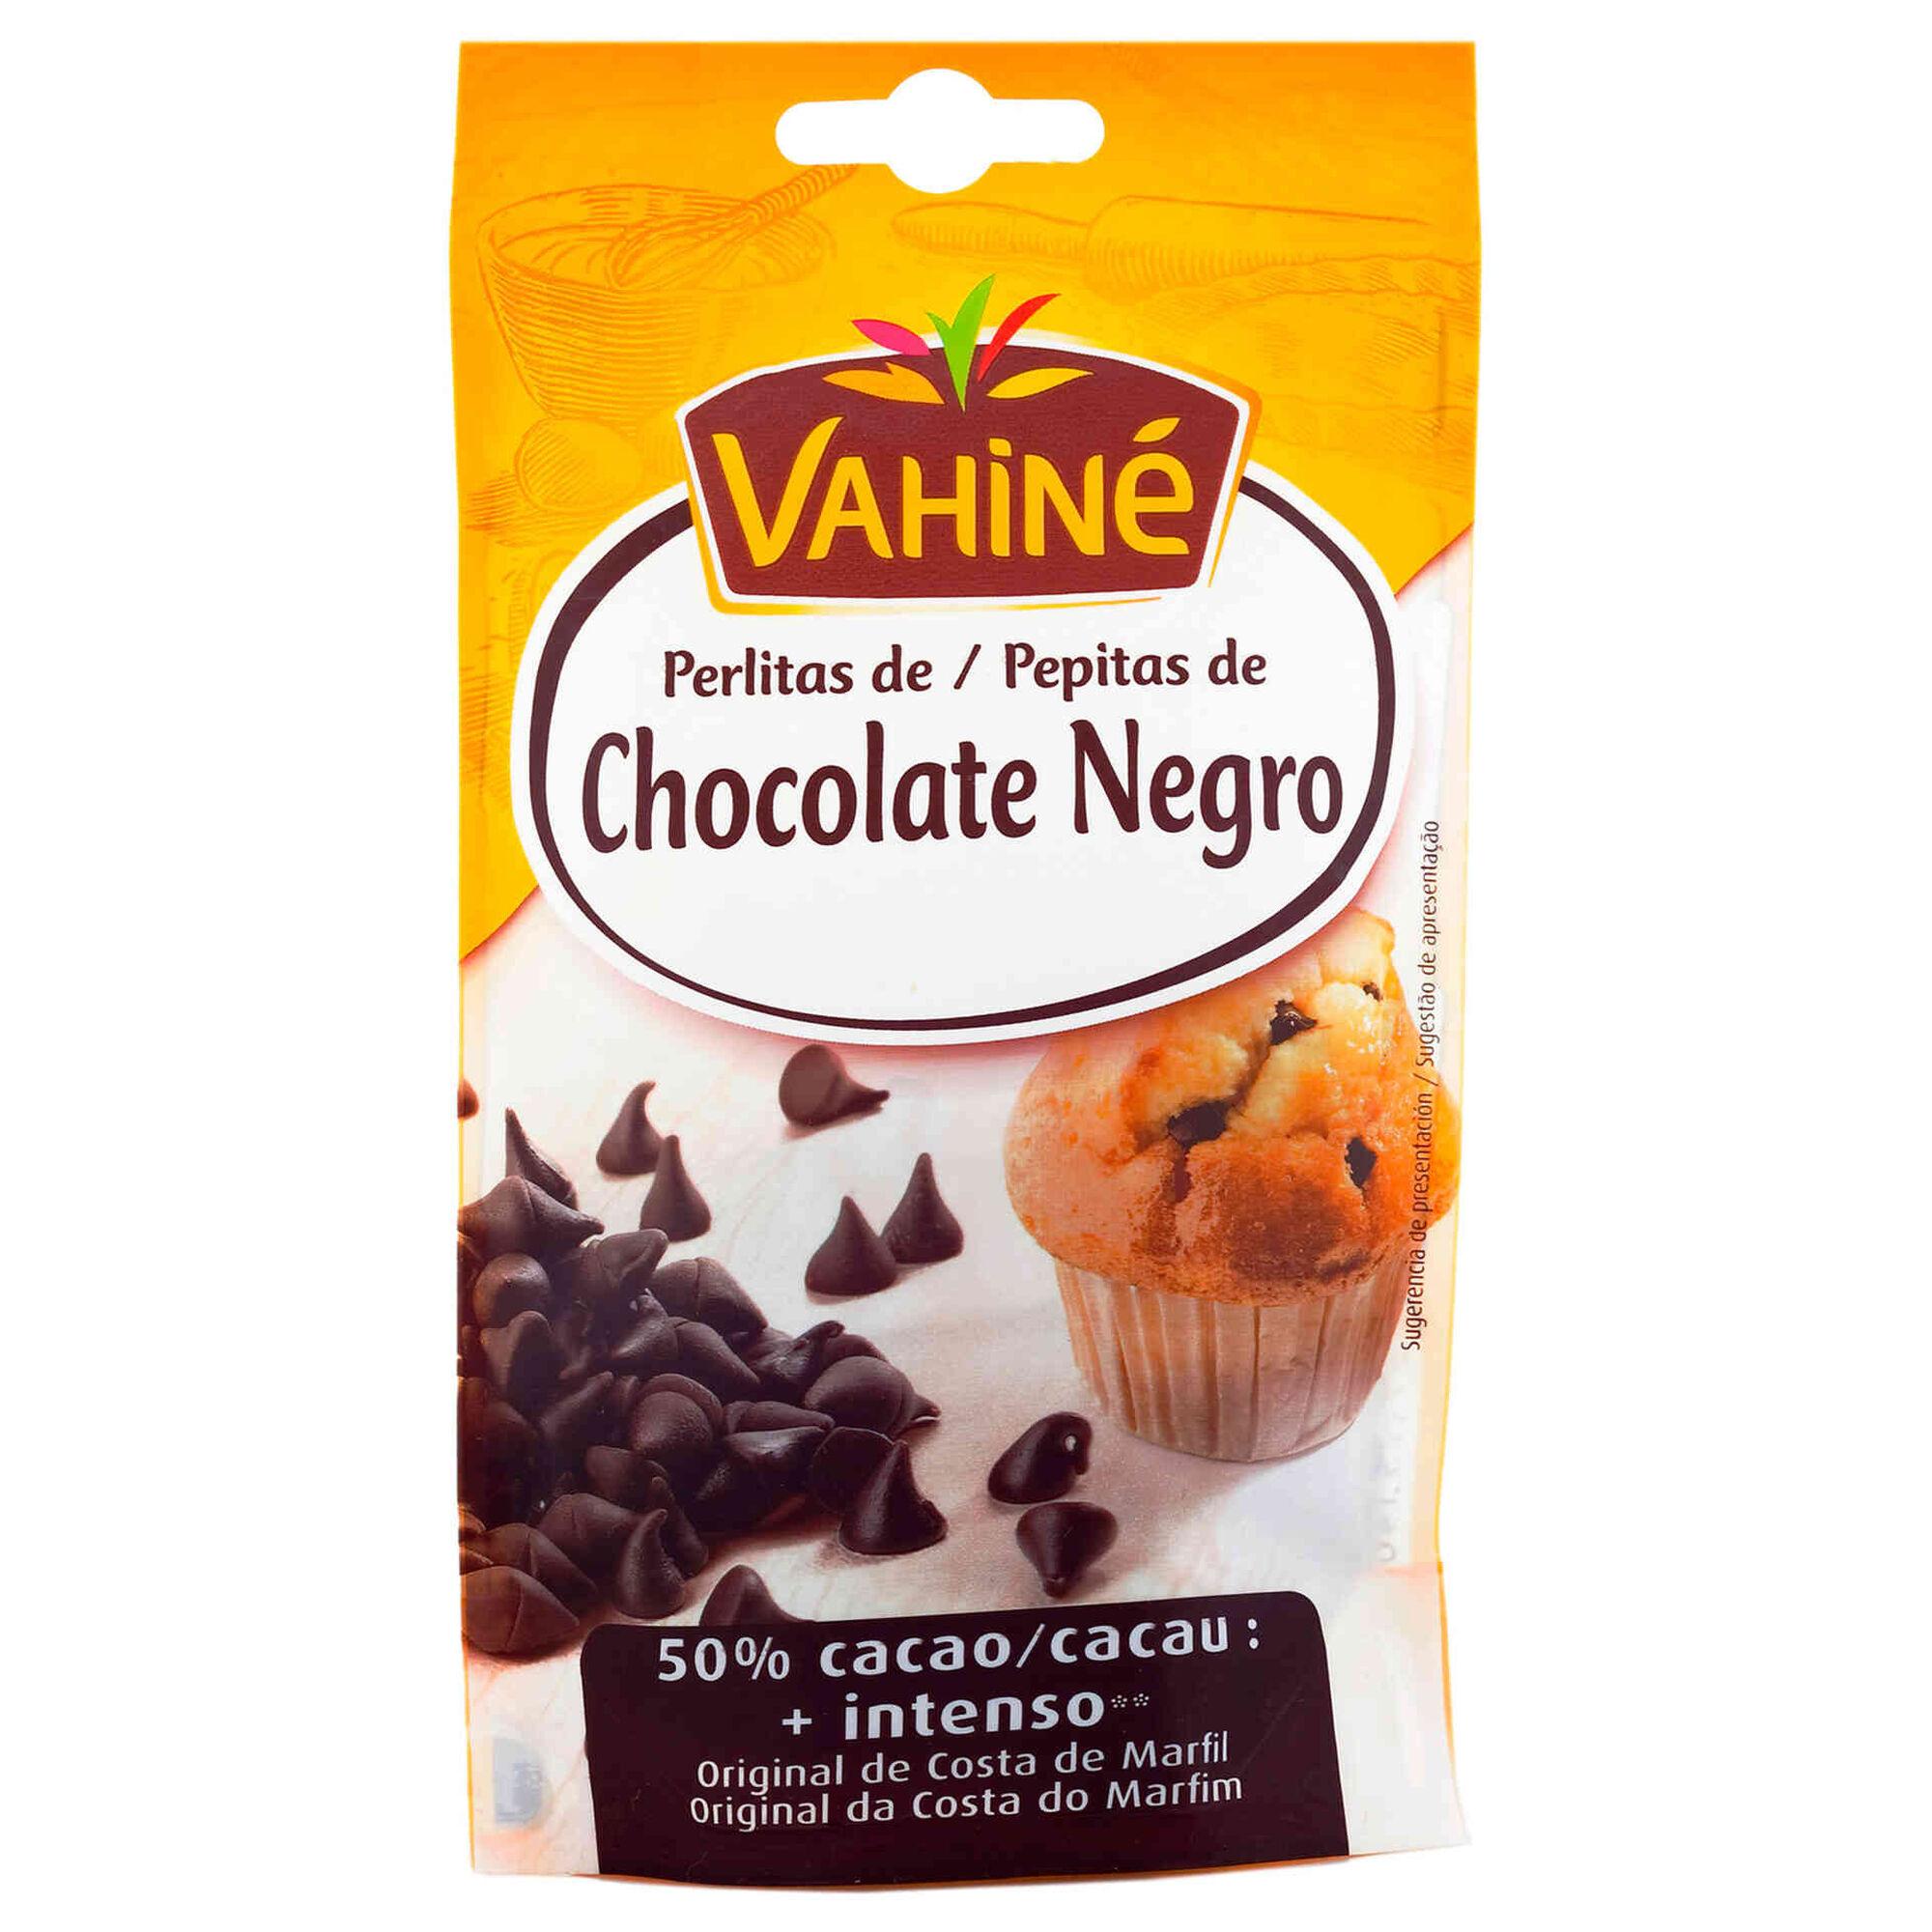 Pepitas de Chocolate Negro